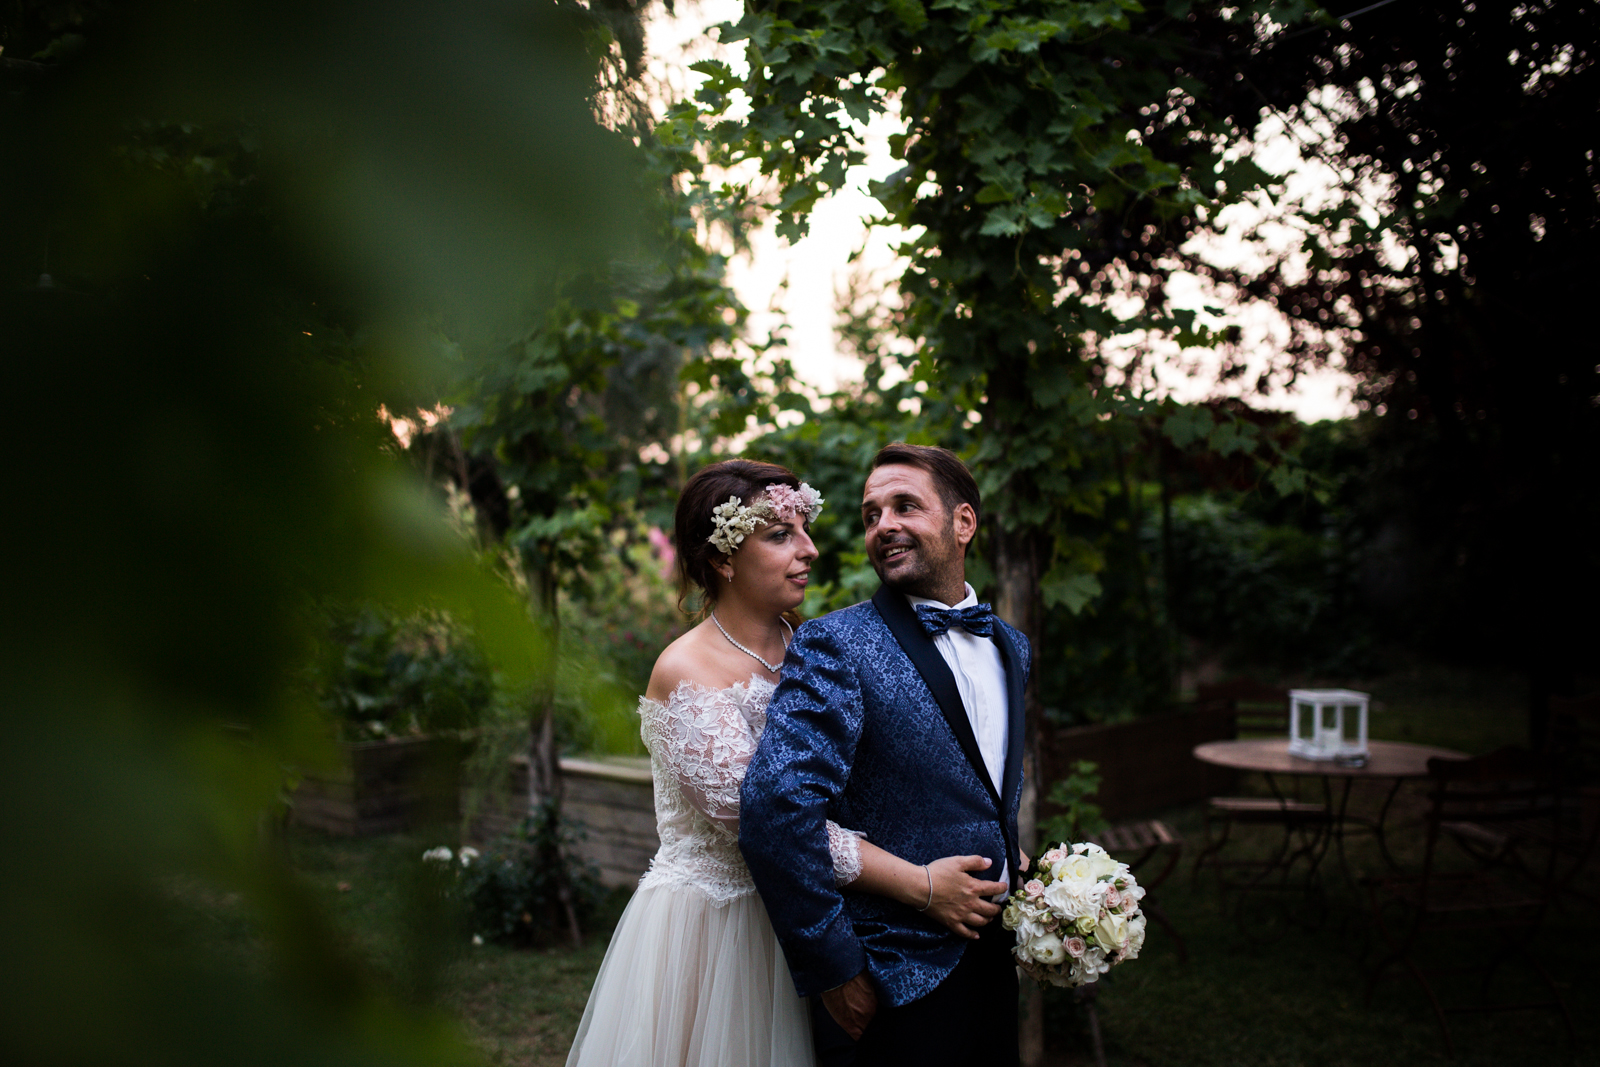 Stefania e Gianbattista matrimonio wedding reportage Brescia Federico Rongaroli